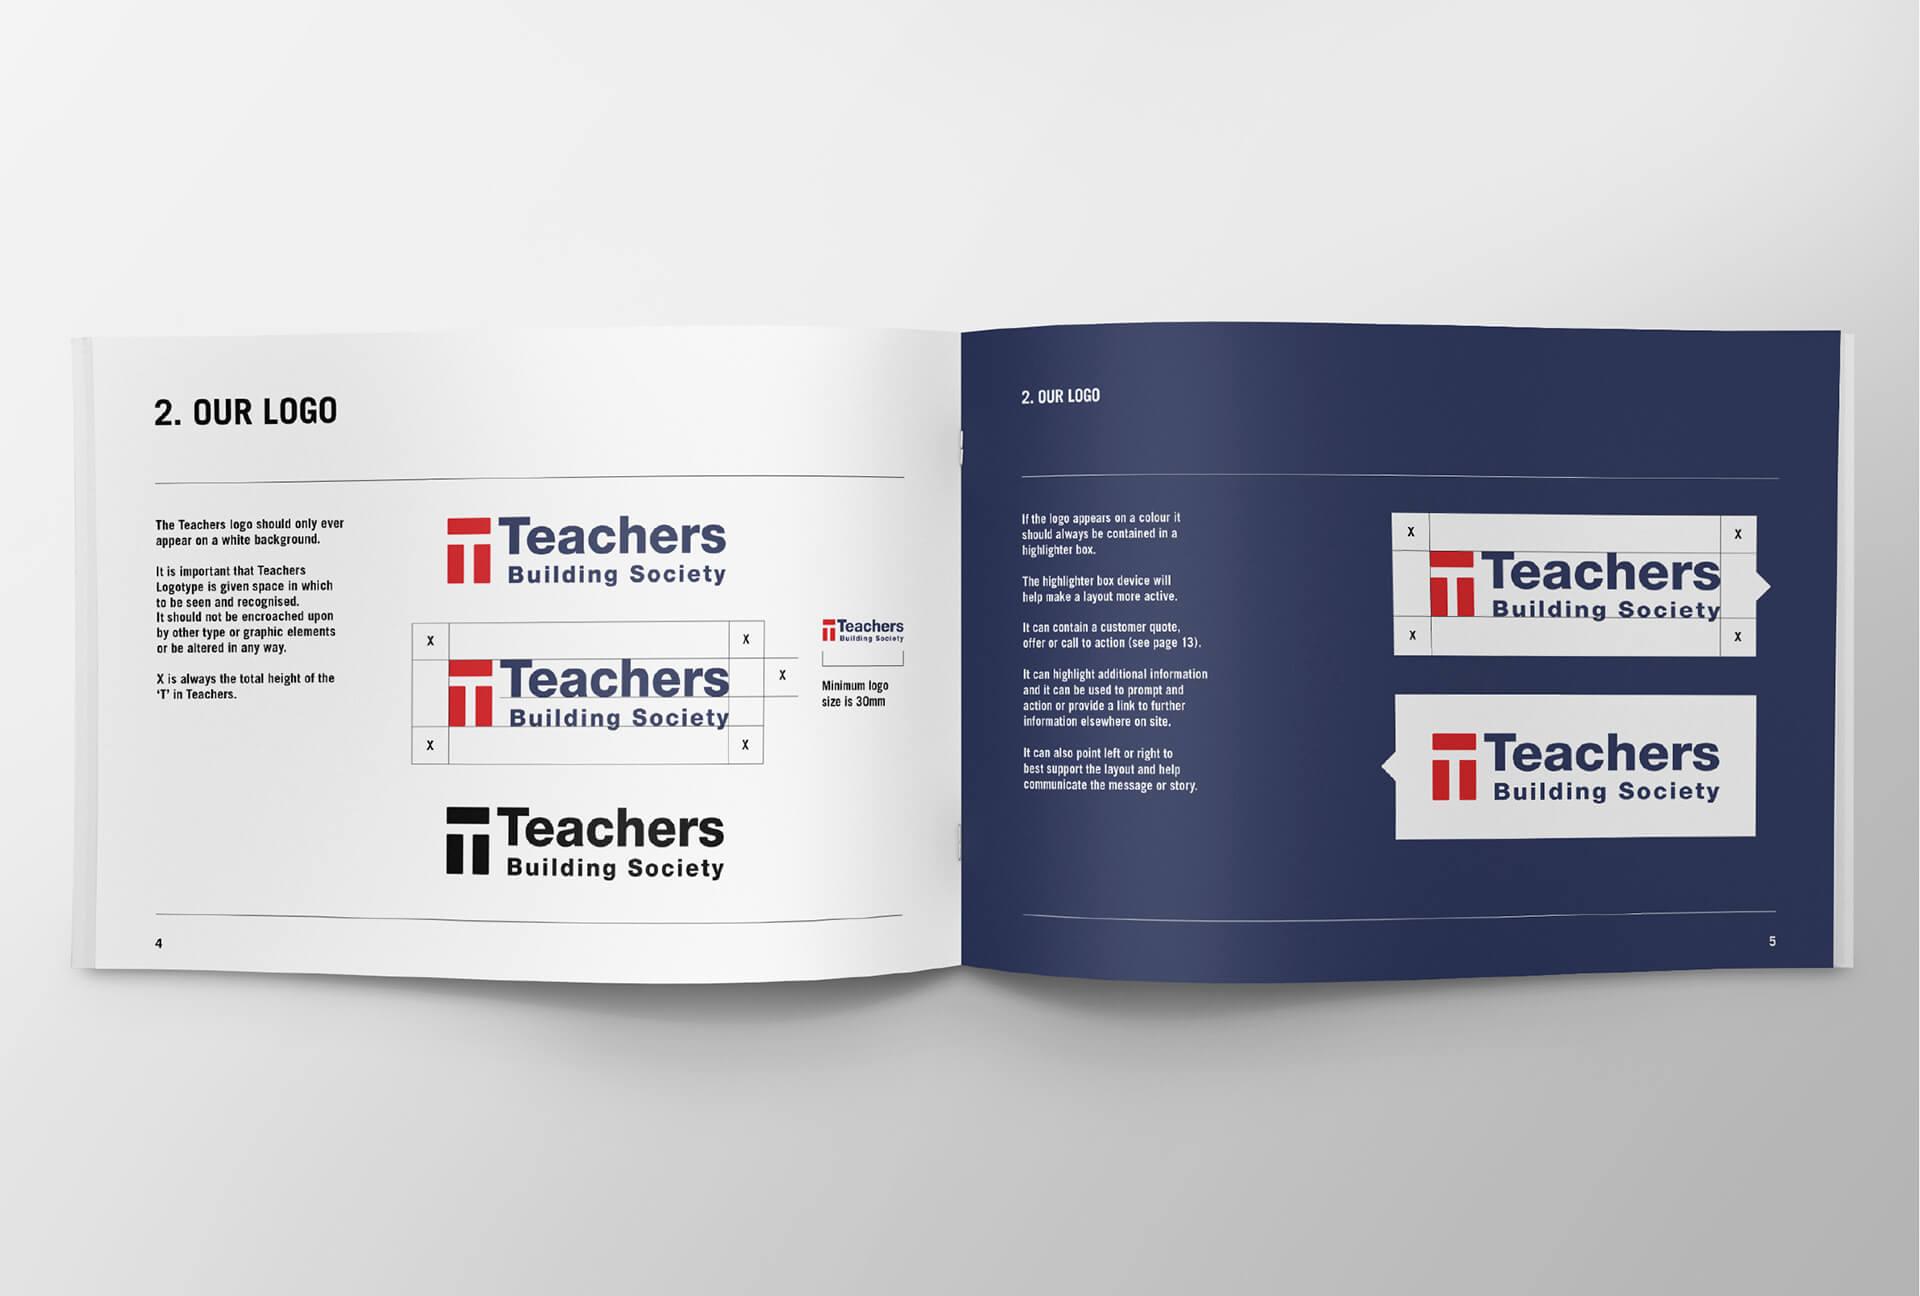 teachers-image-6.jpg